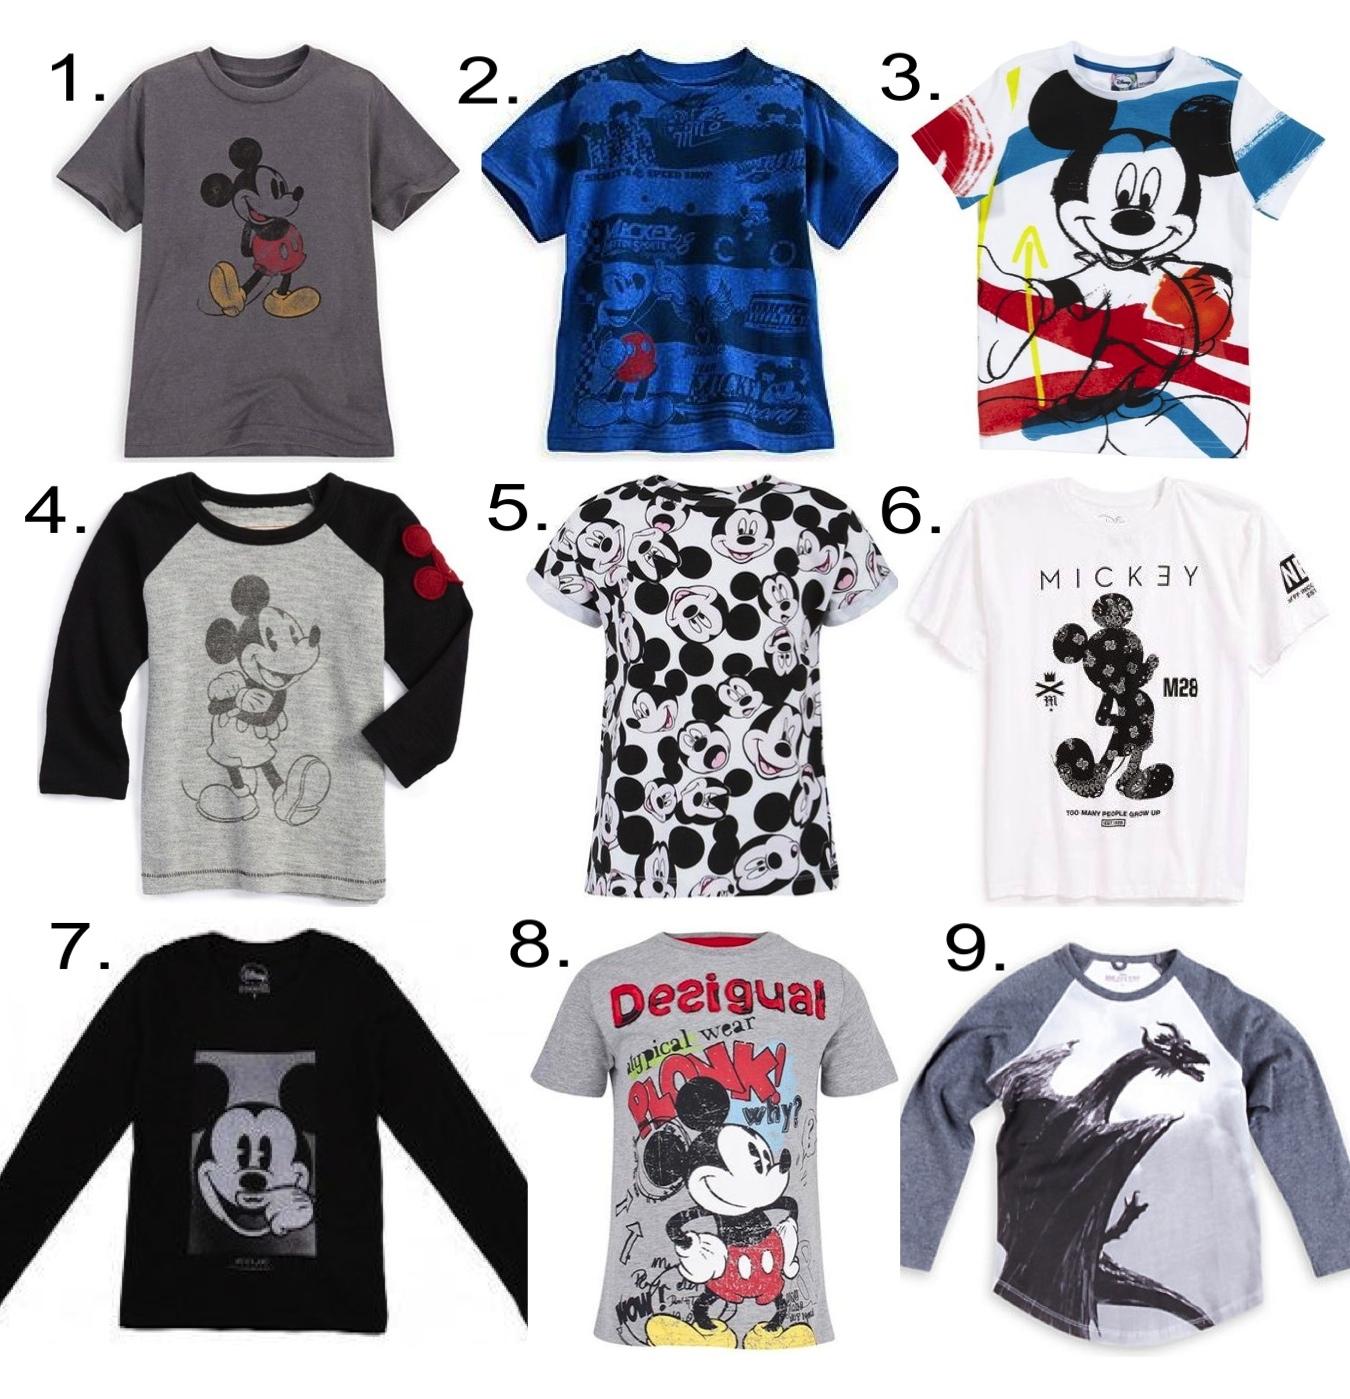 Disney Boys Collaborations  1.  Mickey Mouse Tee    2.  Mickey Mouse Motocross Tee  3.  Desigual T-Shirt  4. Peek 'Curious' Raglan Sleeve Shirt  5.  Little Eleven Paris Mickey Tee  6.  neff 'Paisley Mickey' T-Shirt  7.  LITTLE ELEVEN PARIS Mickey T-Shirt  8.  Desigual Mickey Mouse Tee  9.  Dragon Maleficent by Stella McCartney